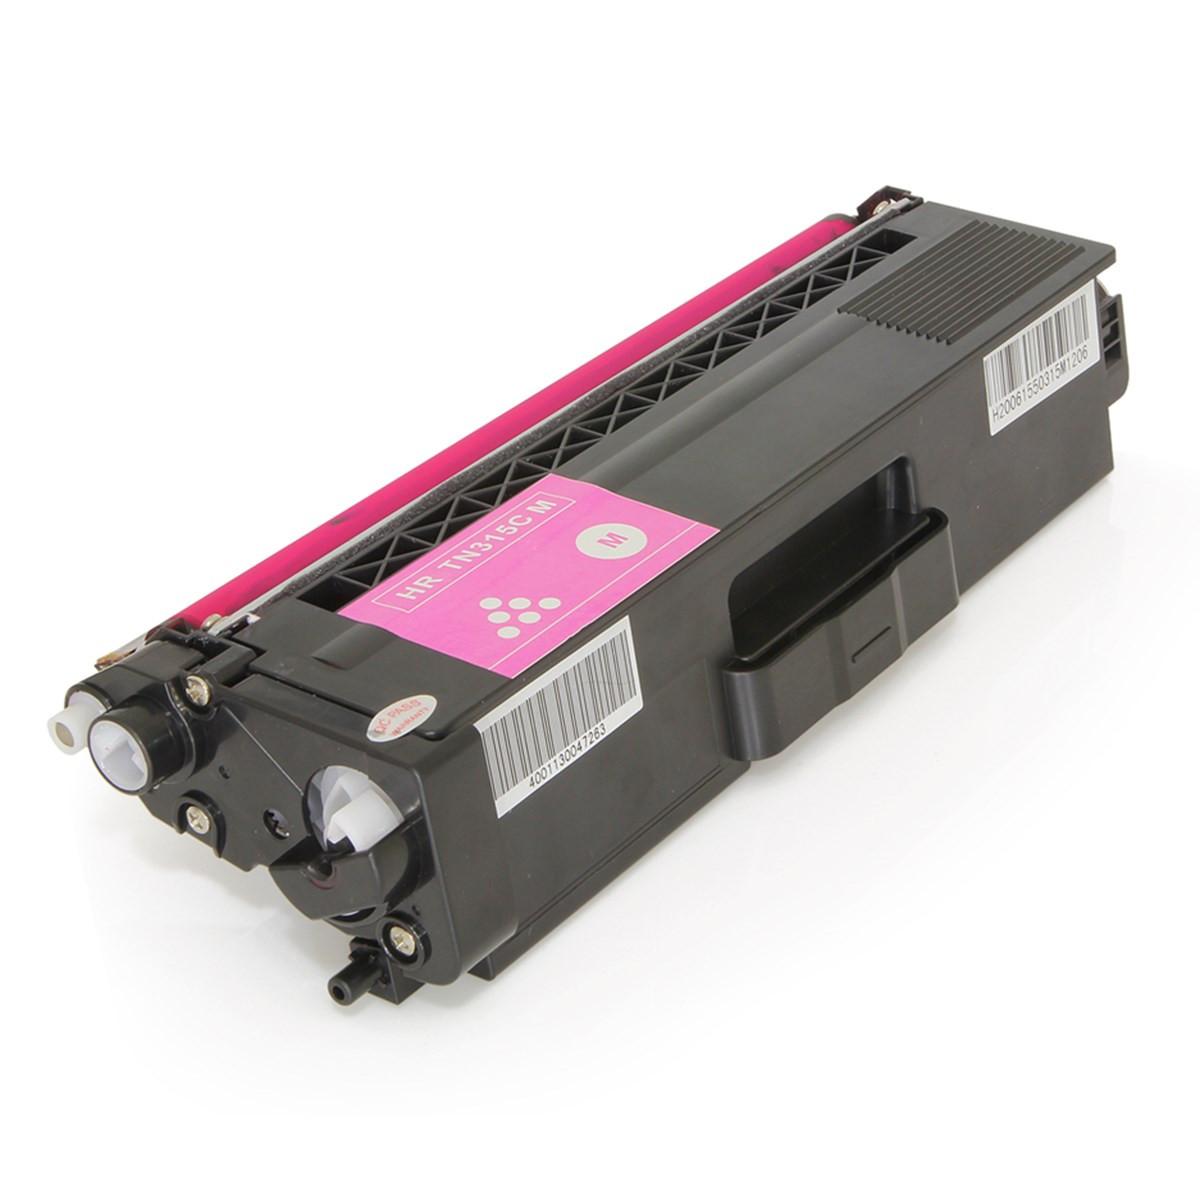 Toner Compatível com Brother TN310 TN310M Magenta | HL4150CDN MFC9560CDW HL4570CDW | Importado 3.5k